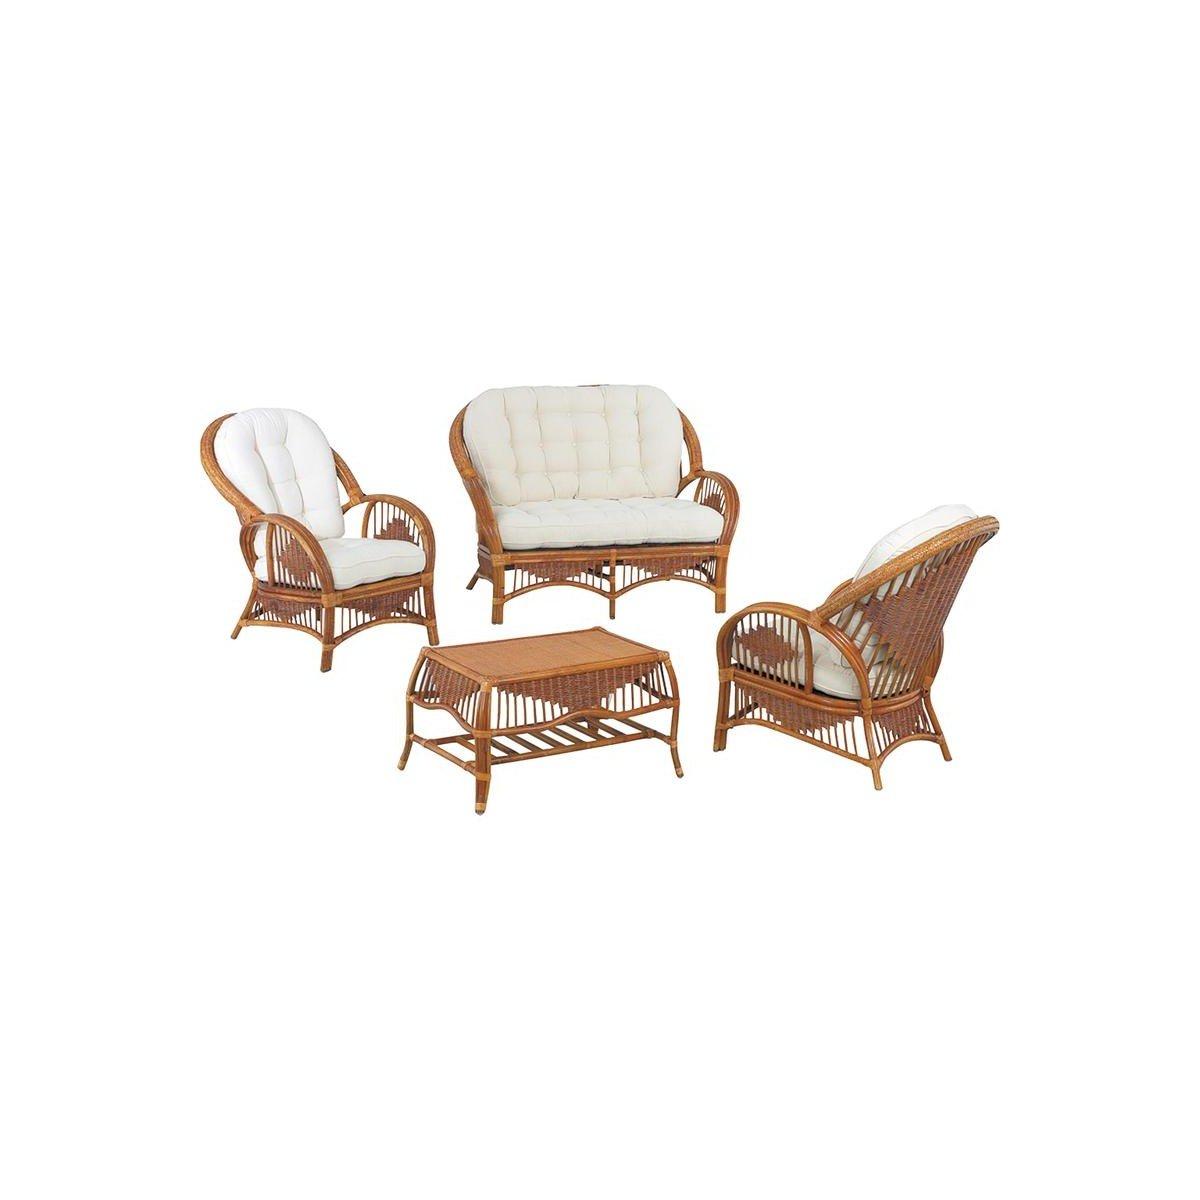 Gartenmöbel, Rattan, 4-teilig, 2-Sitzer-Sofa aus Korbgeflecht ...